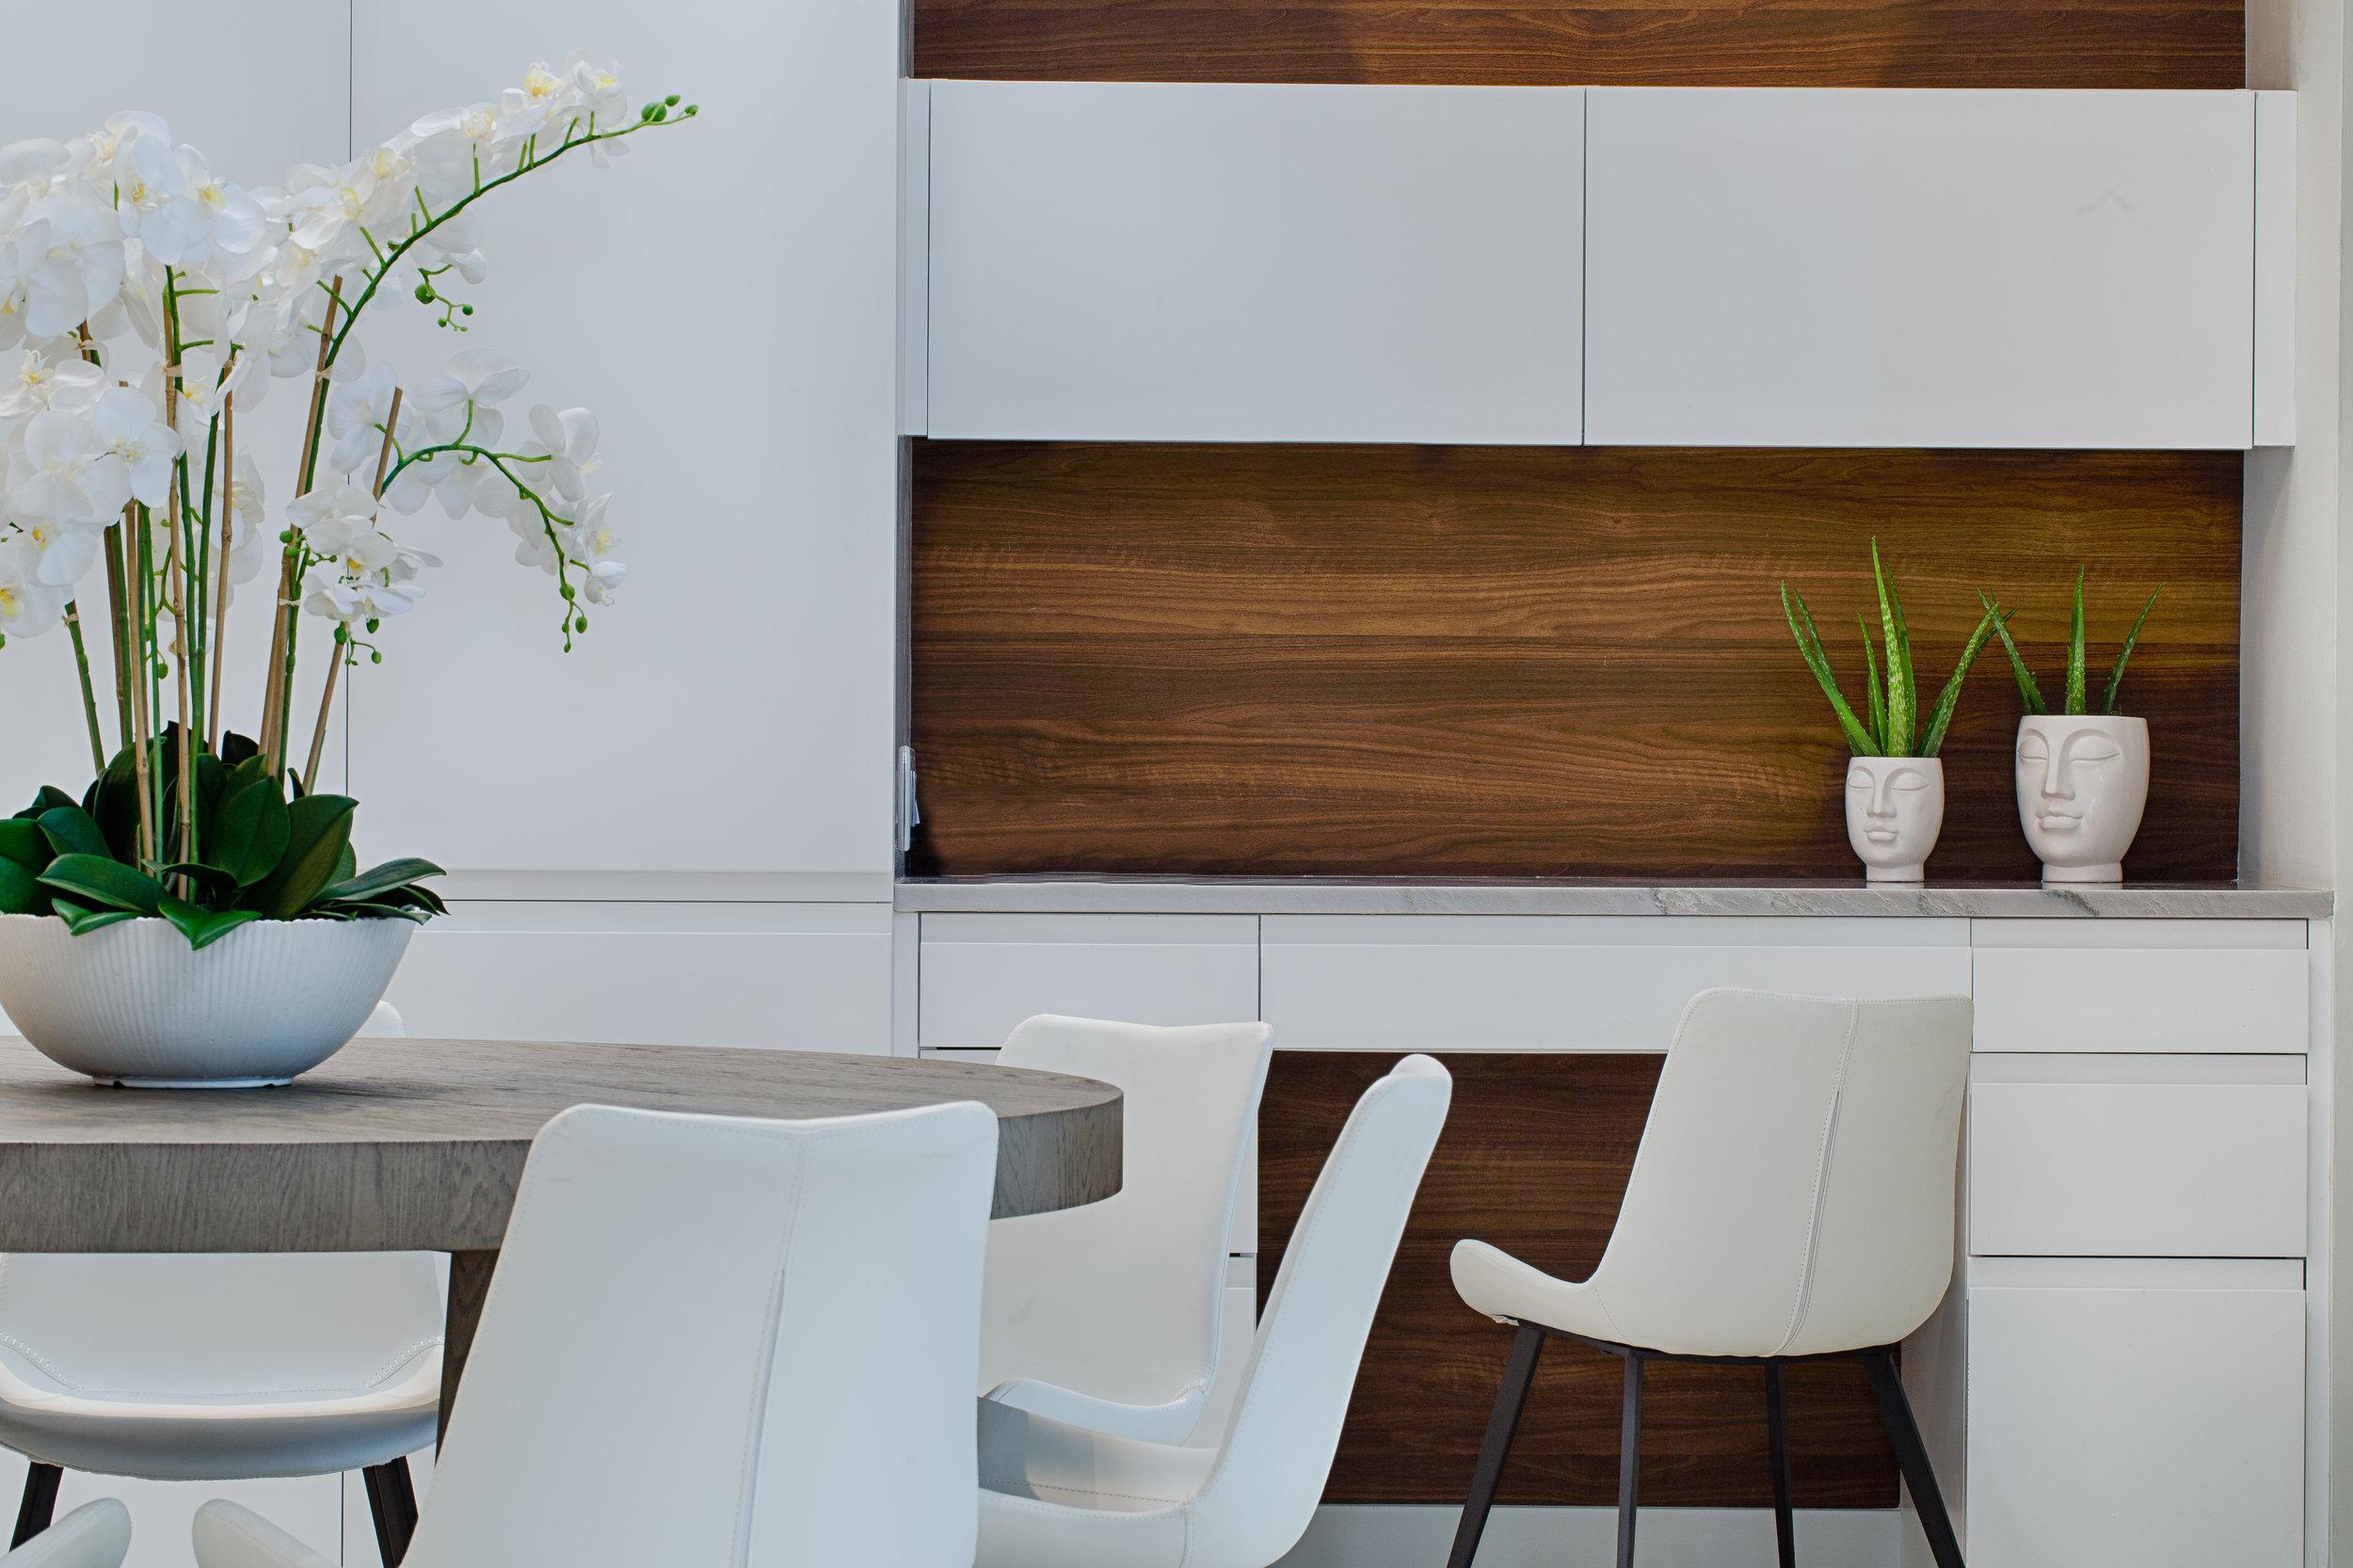 Contemporary Interior Design in West Boca Raton, Fl, Rooms by Eve, Eve Joss4.jpg